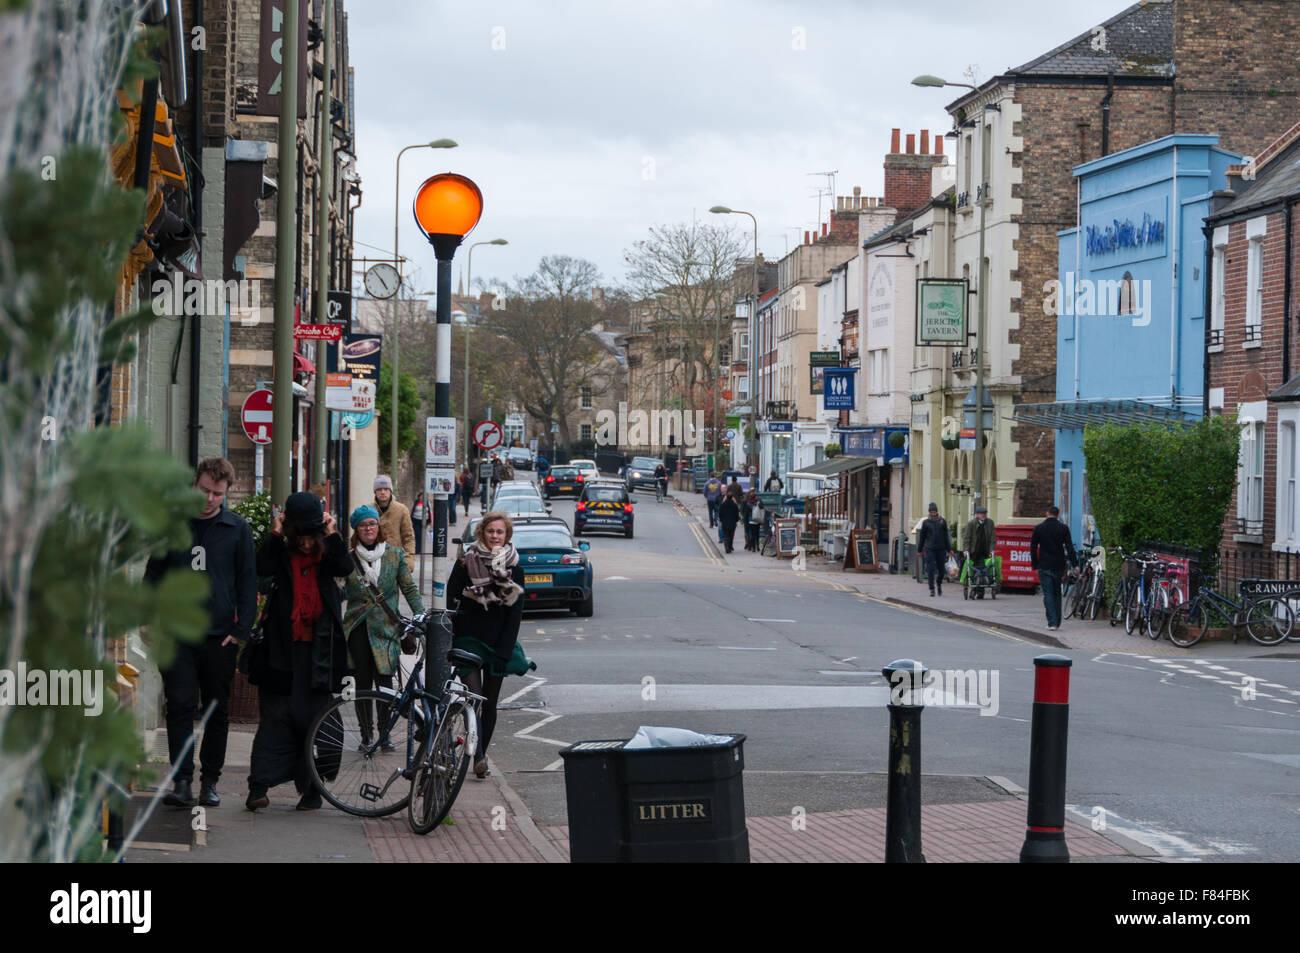 Jericho, Oxford, United Kingdom - Stock Image